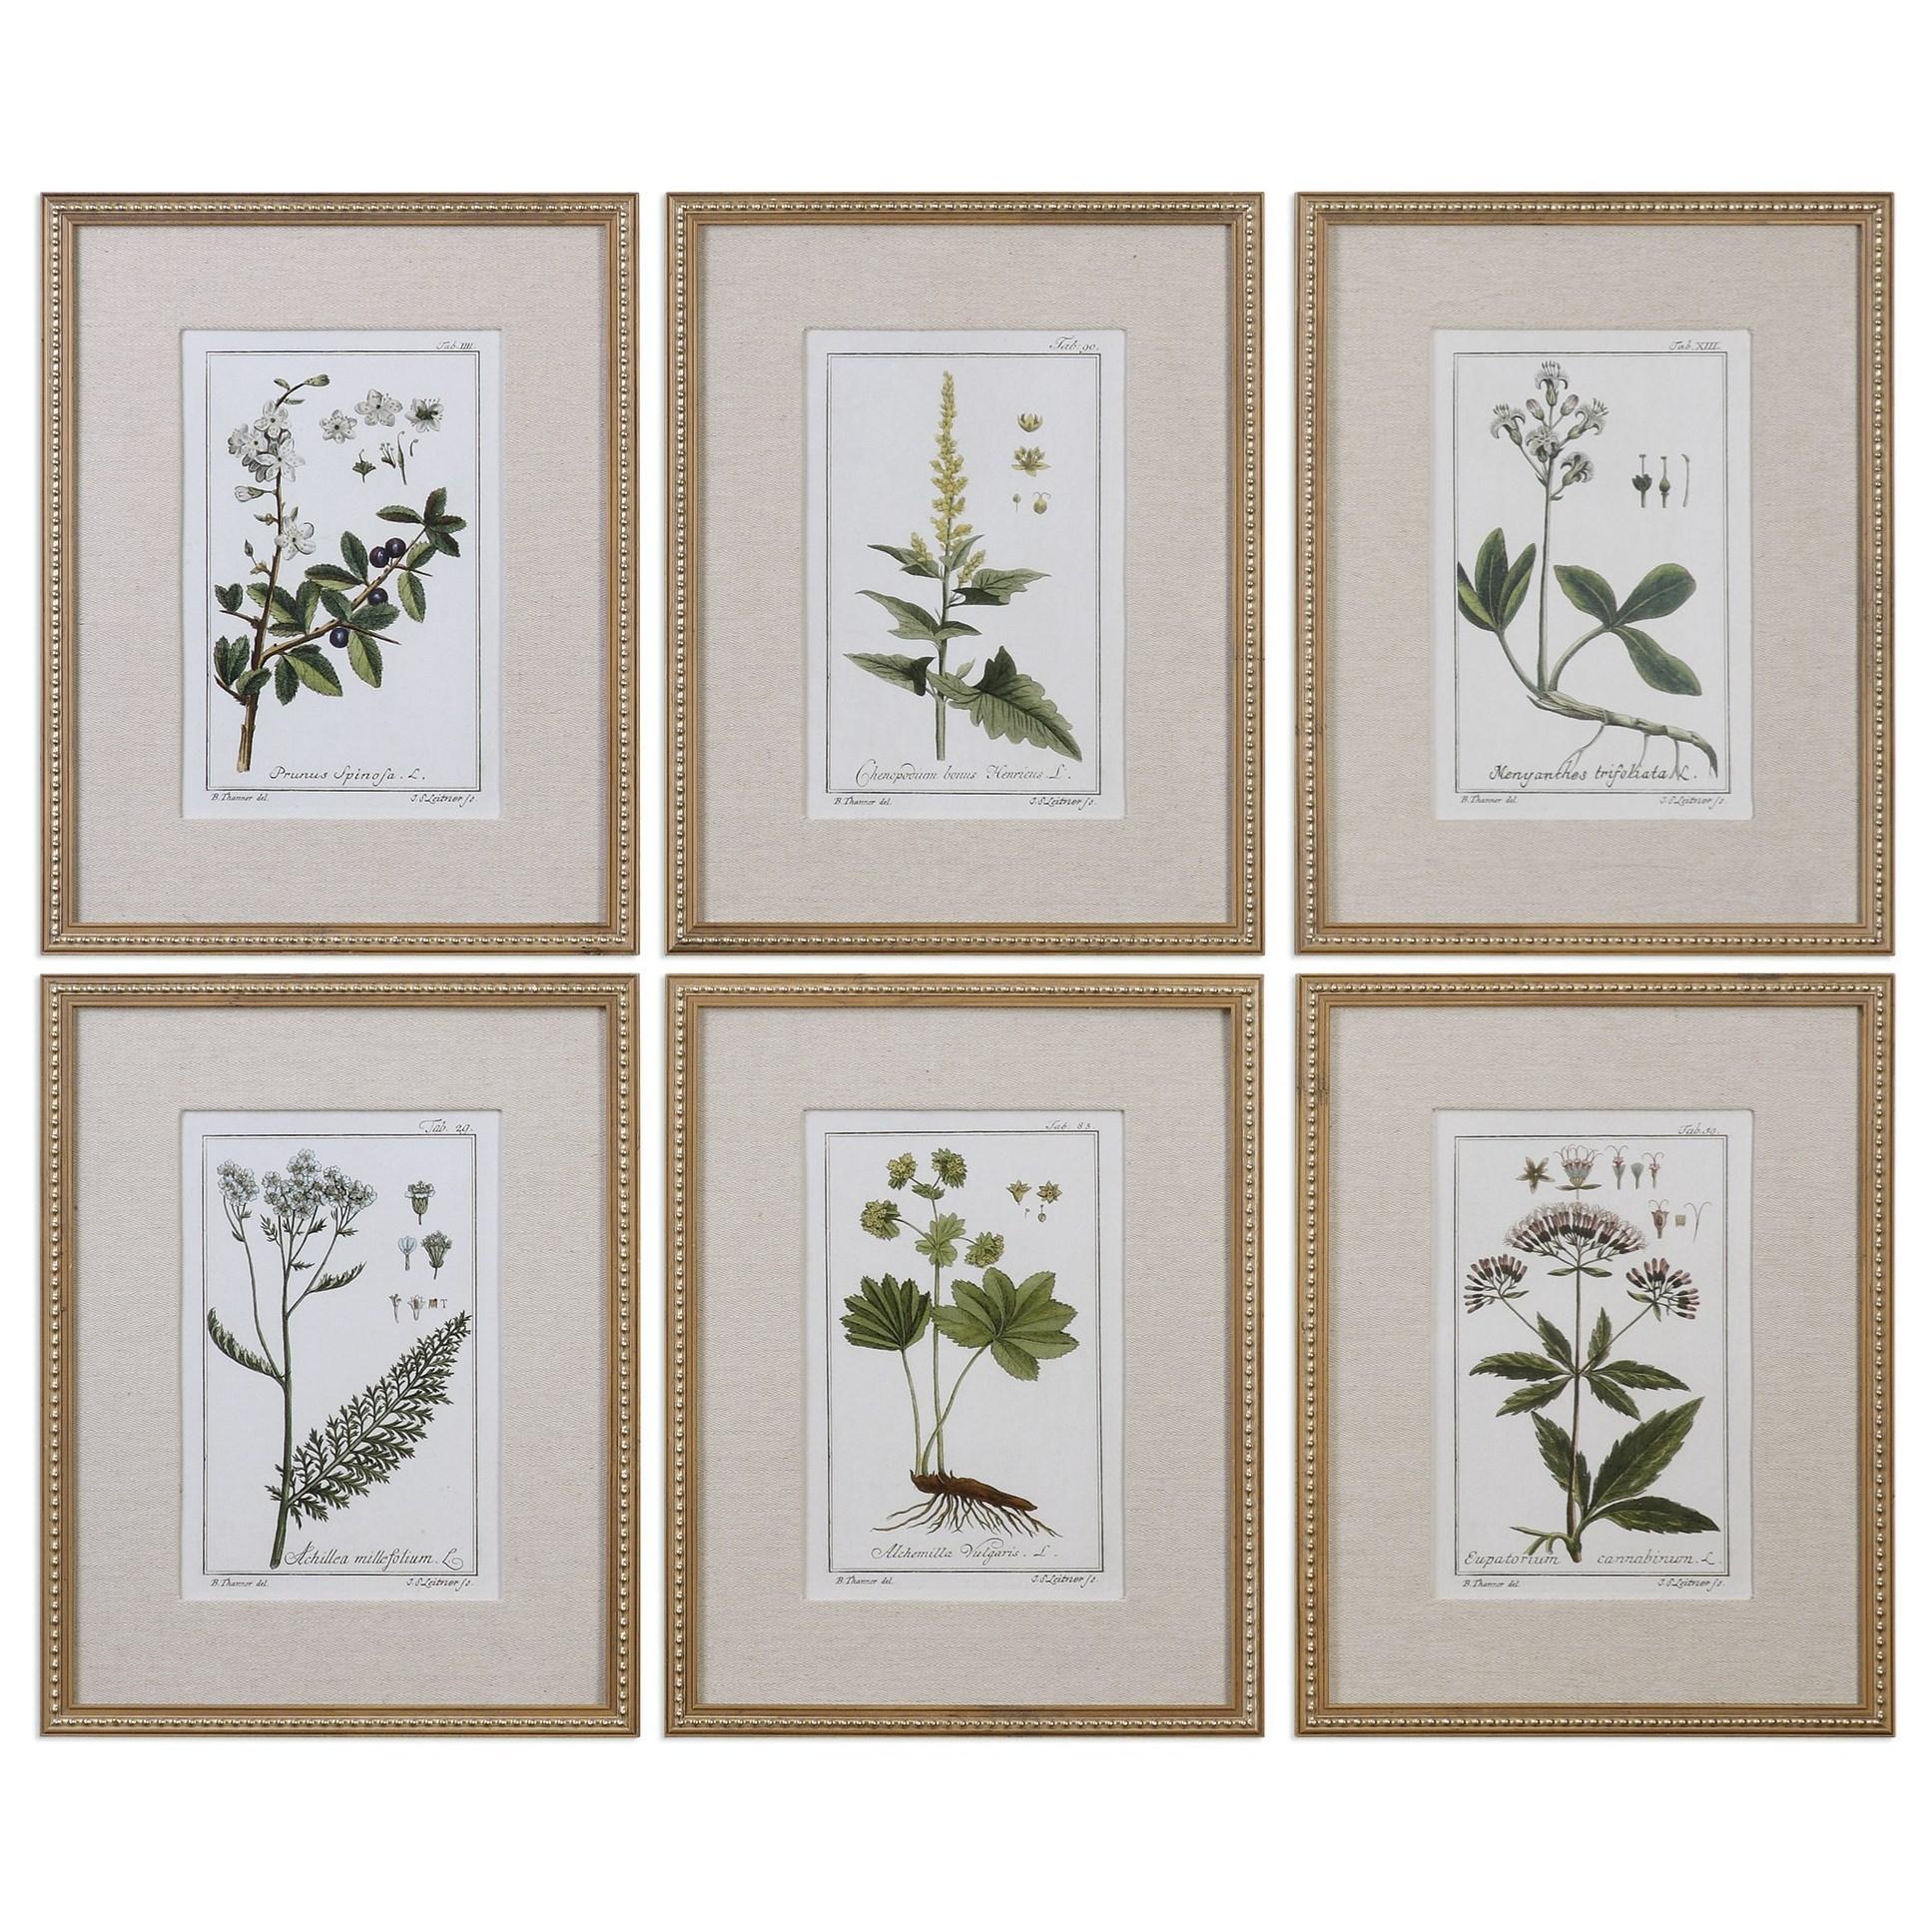 Framed Prints Green Floral Botanical Study (Set of 6) by Uttermost at Upper Room Home Furnishings